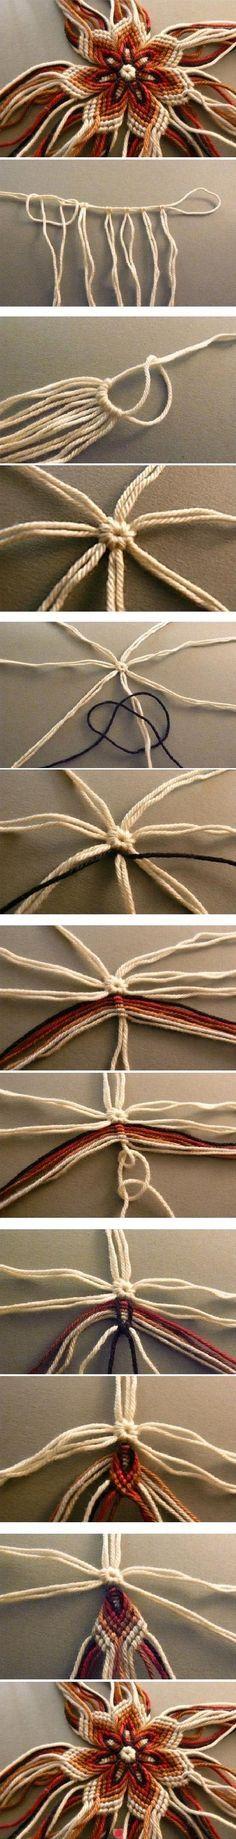 DIY No-Knit Weaving Flower of Yarn